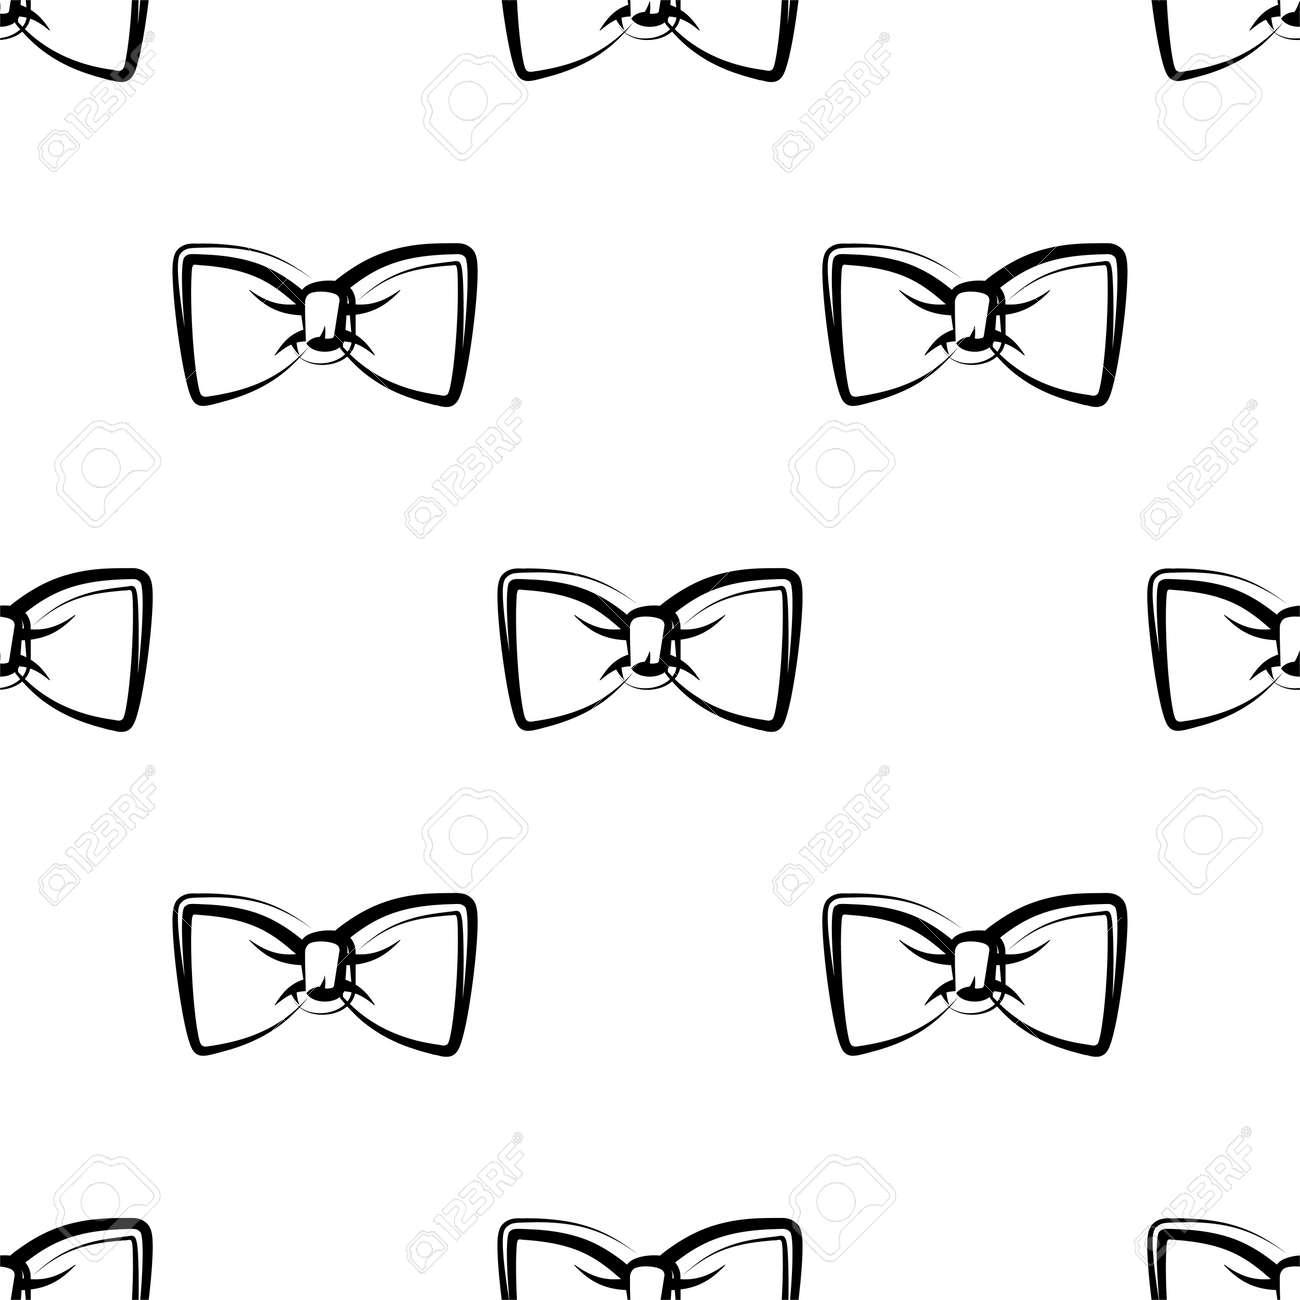 Bow Tie Icon Seamless Pattern Vector Art Illustration - 149570970